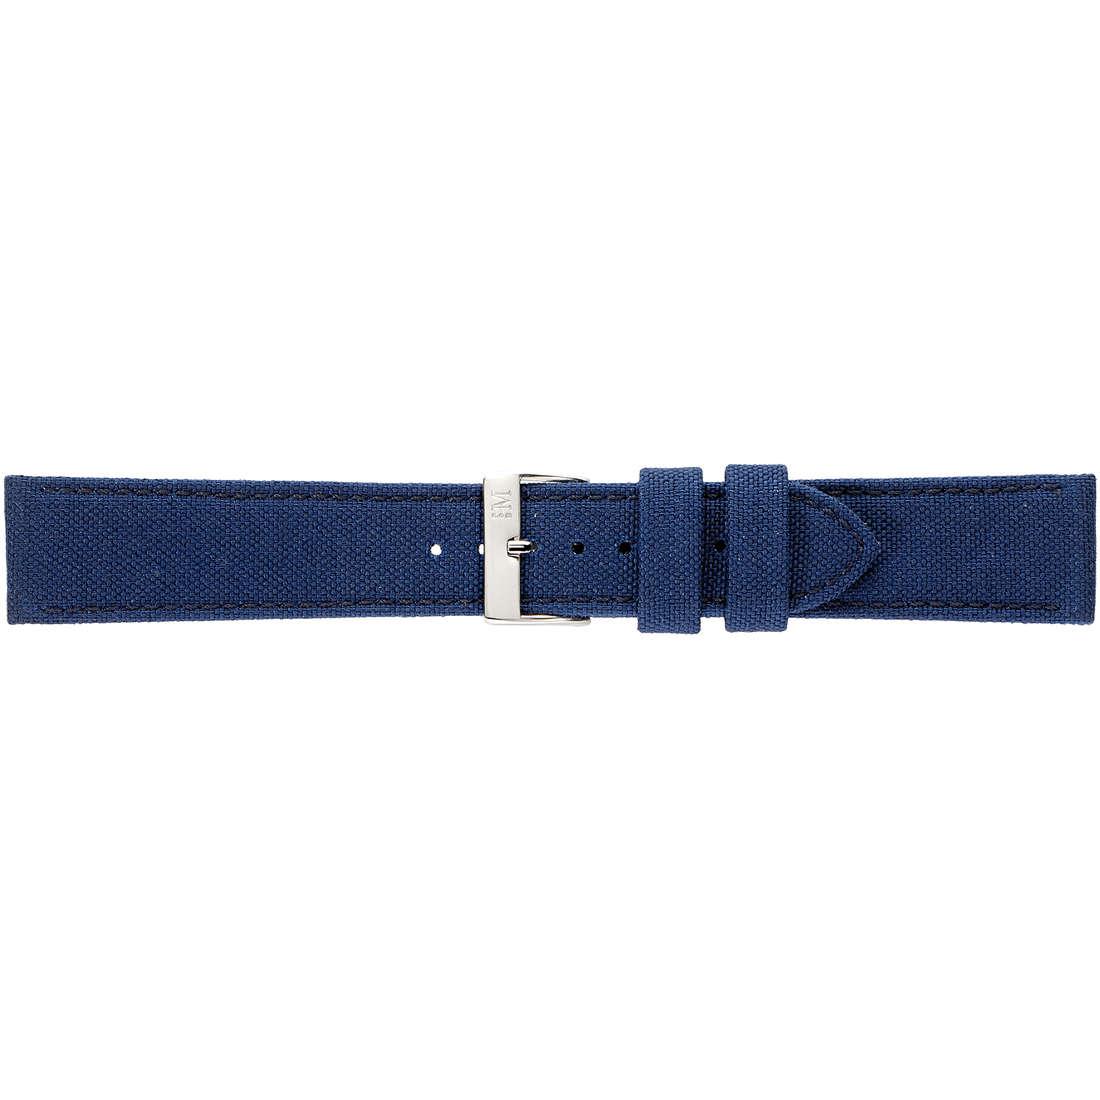 montre bande de montres homme Morellato Linea Sport A01U2779110061CR24